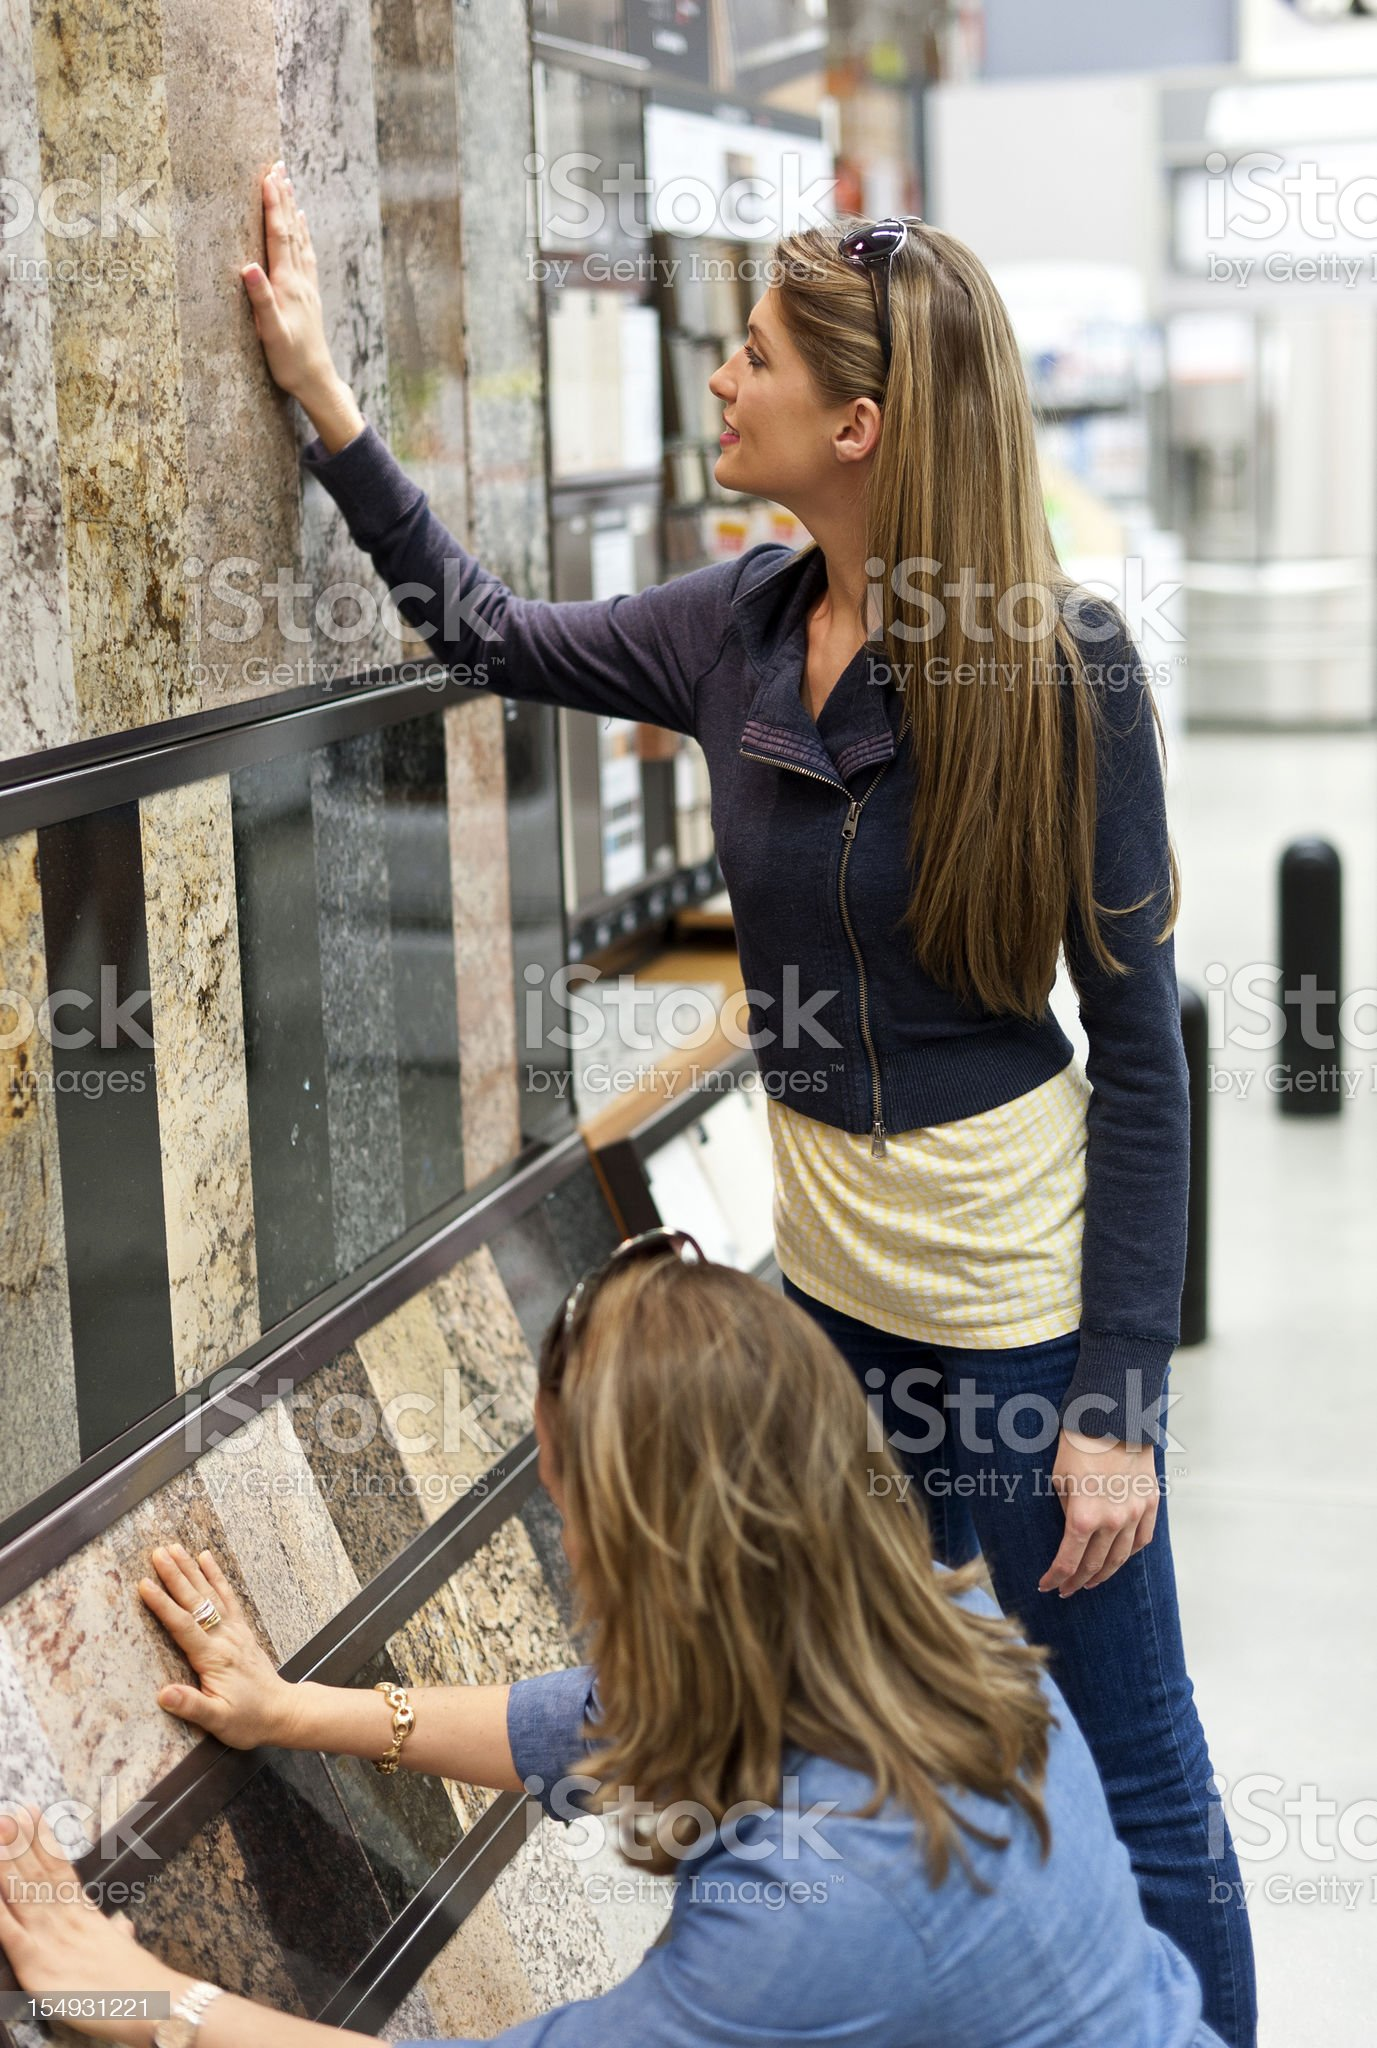 Choosing Granite Marble royalty-free stock photo